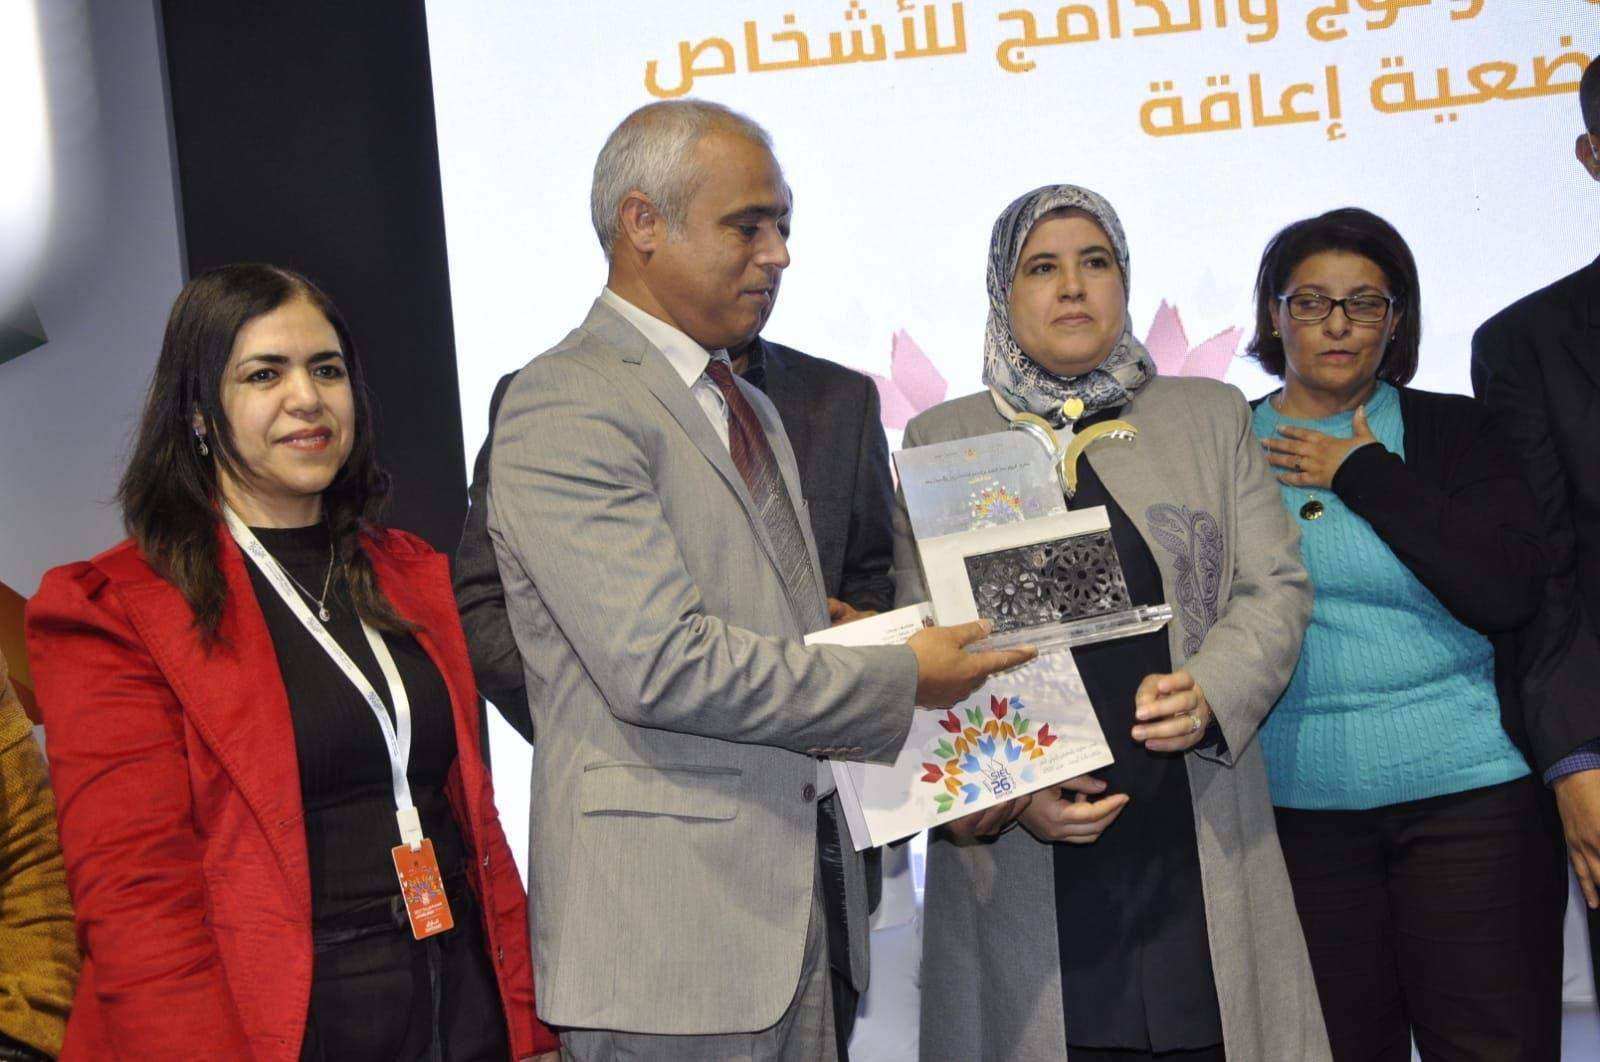 Photo of رئاسة النيابة العامة تتوج بجائزة الرواق سهل الولوج بالمعرض الدولي للكتاب